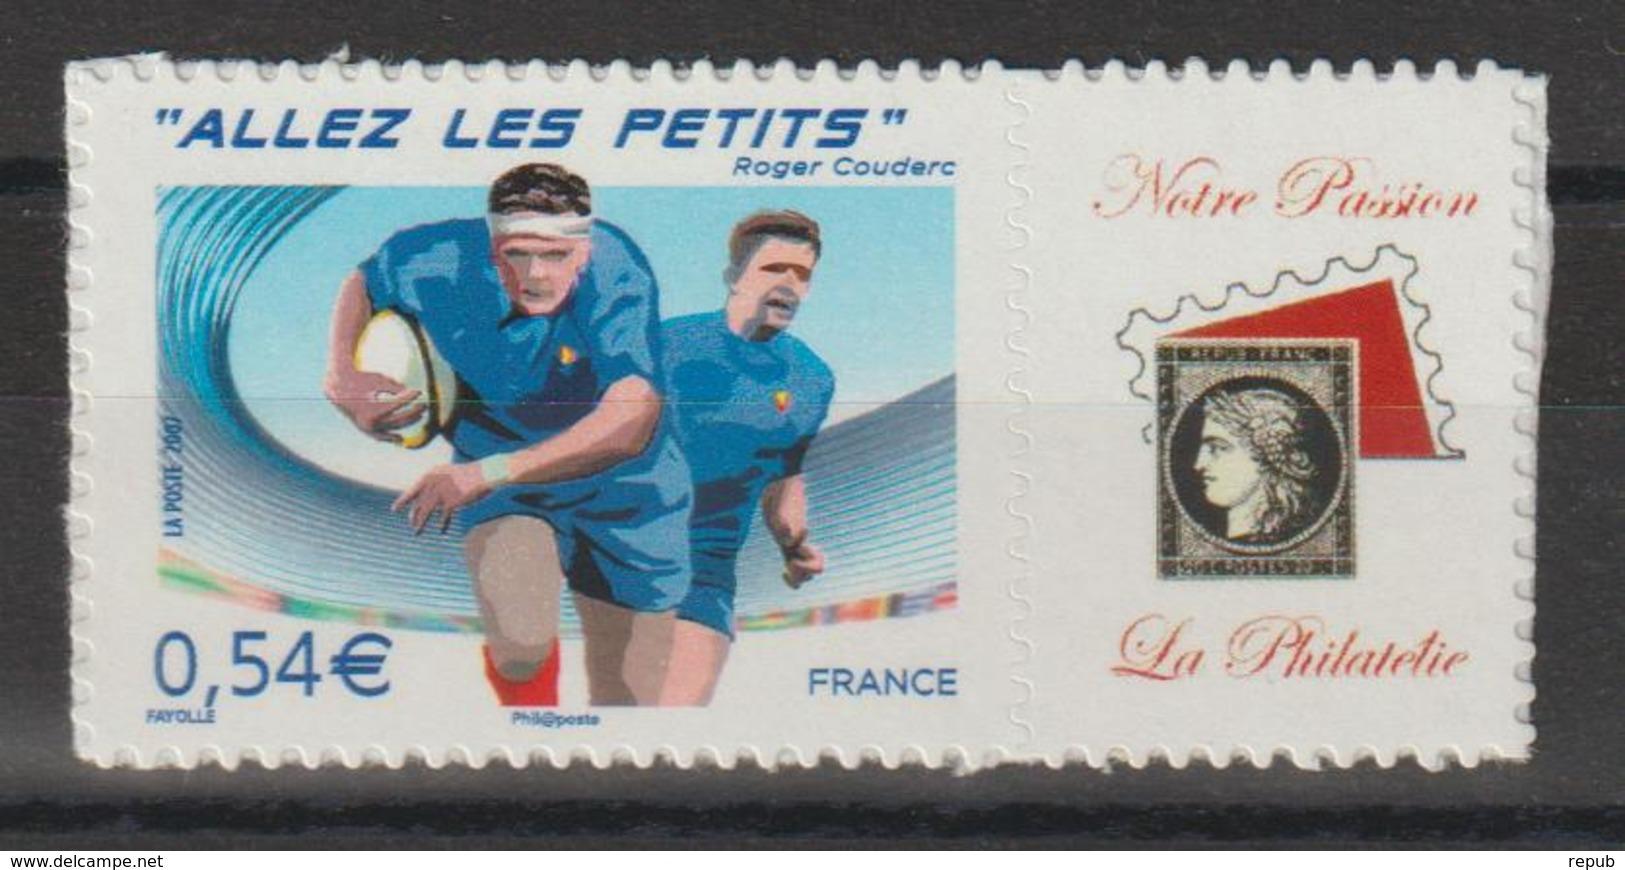 France Personnalisés 2007 Allez Les Petits 4032B ** MNH - Francia